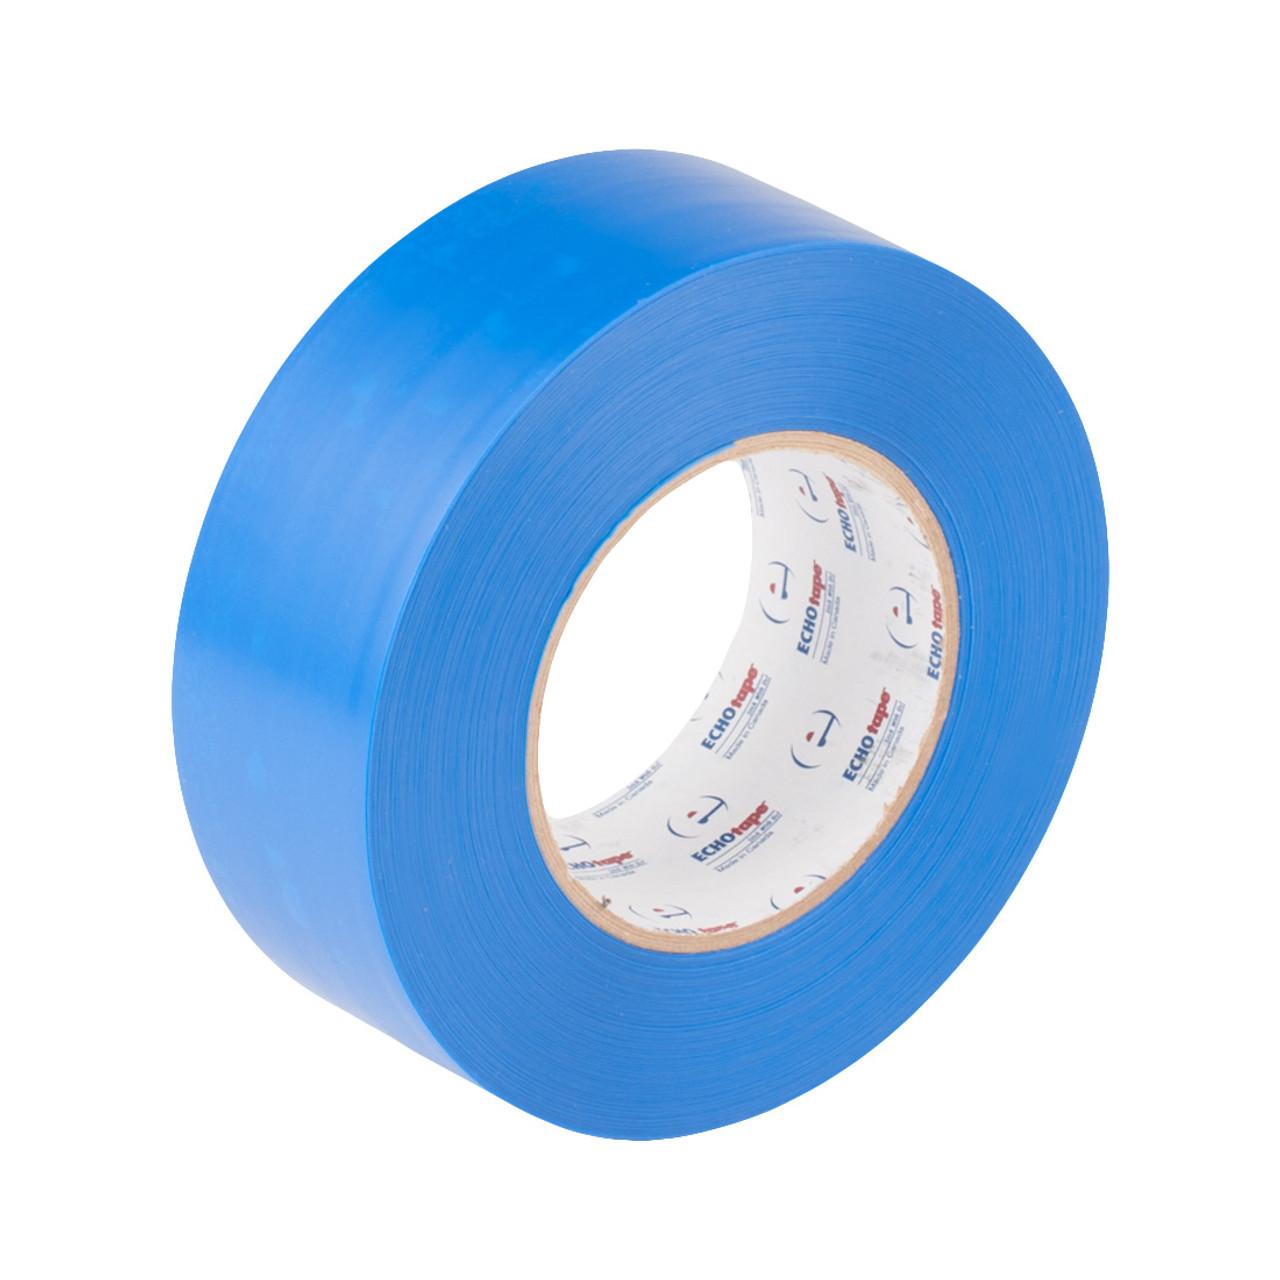 Gaffers Adhesive Black Cloth Tape High Temp Insulation No Residue Multi-Purpose